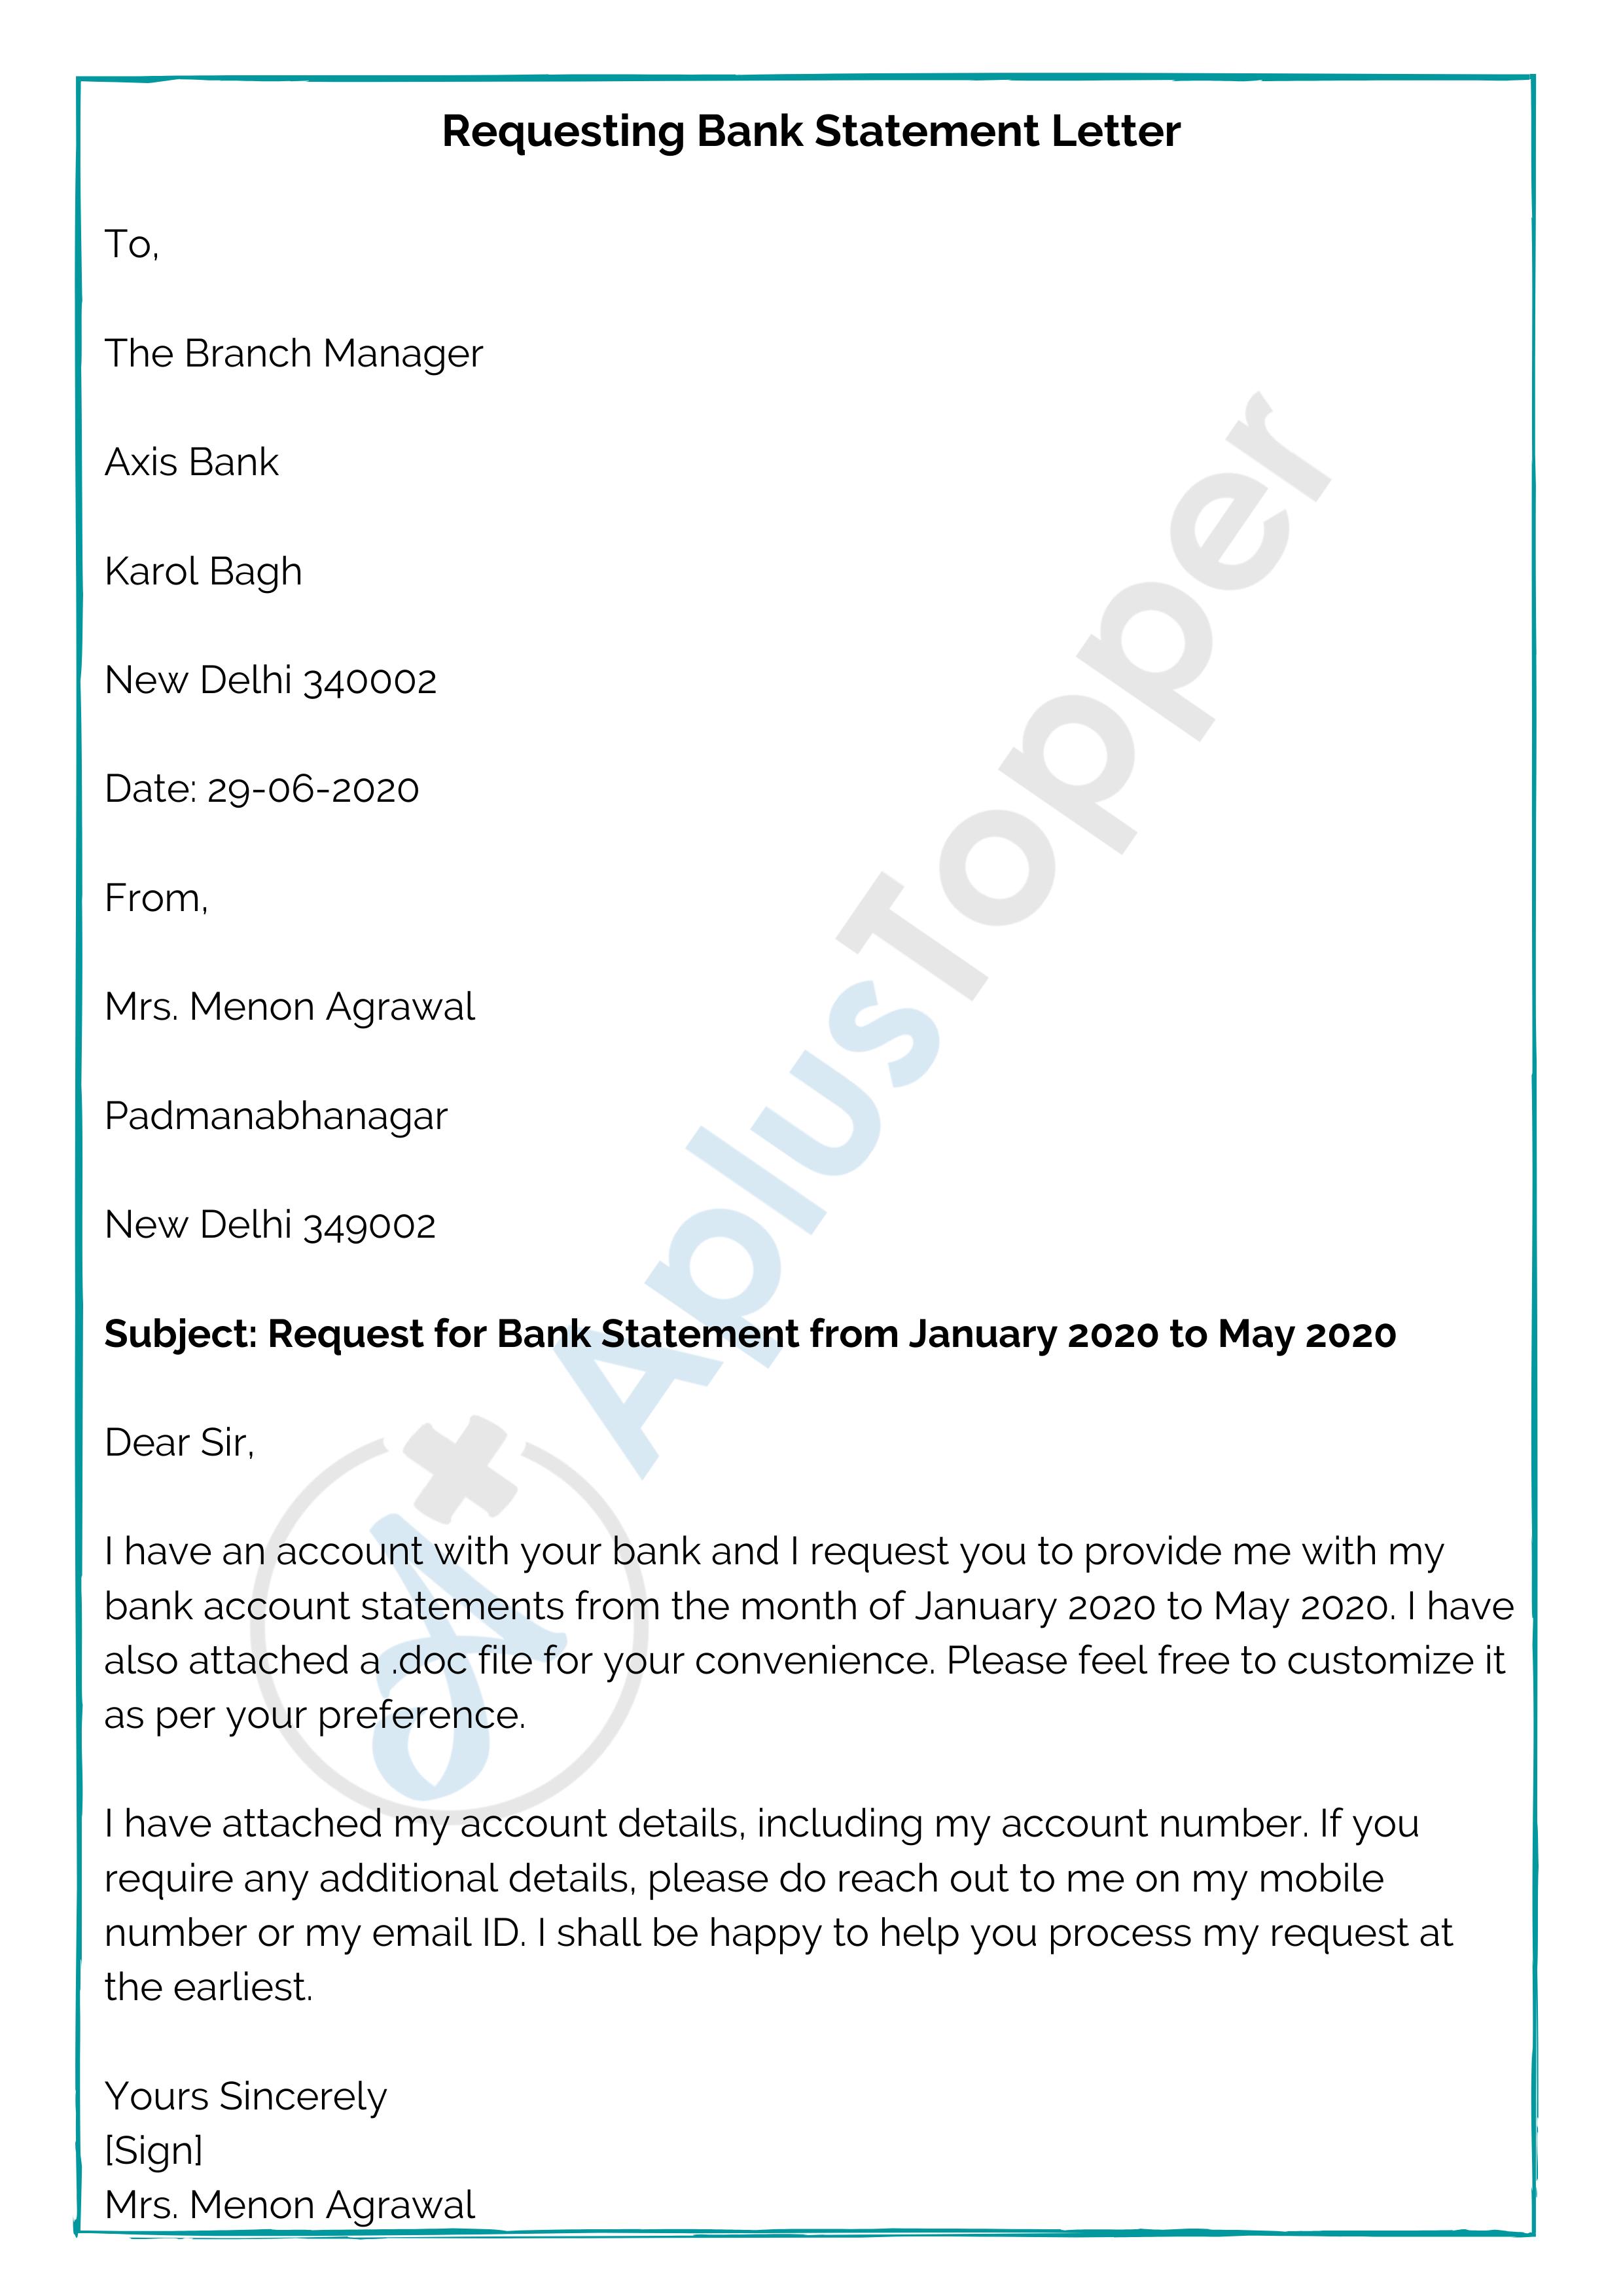 Bank Statement Letter Format